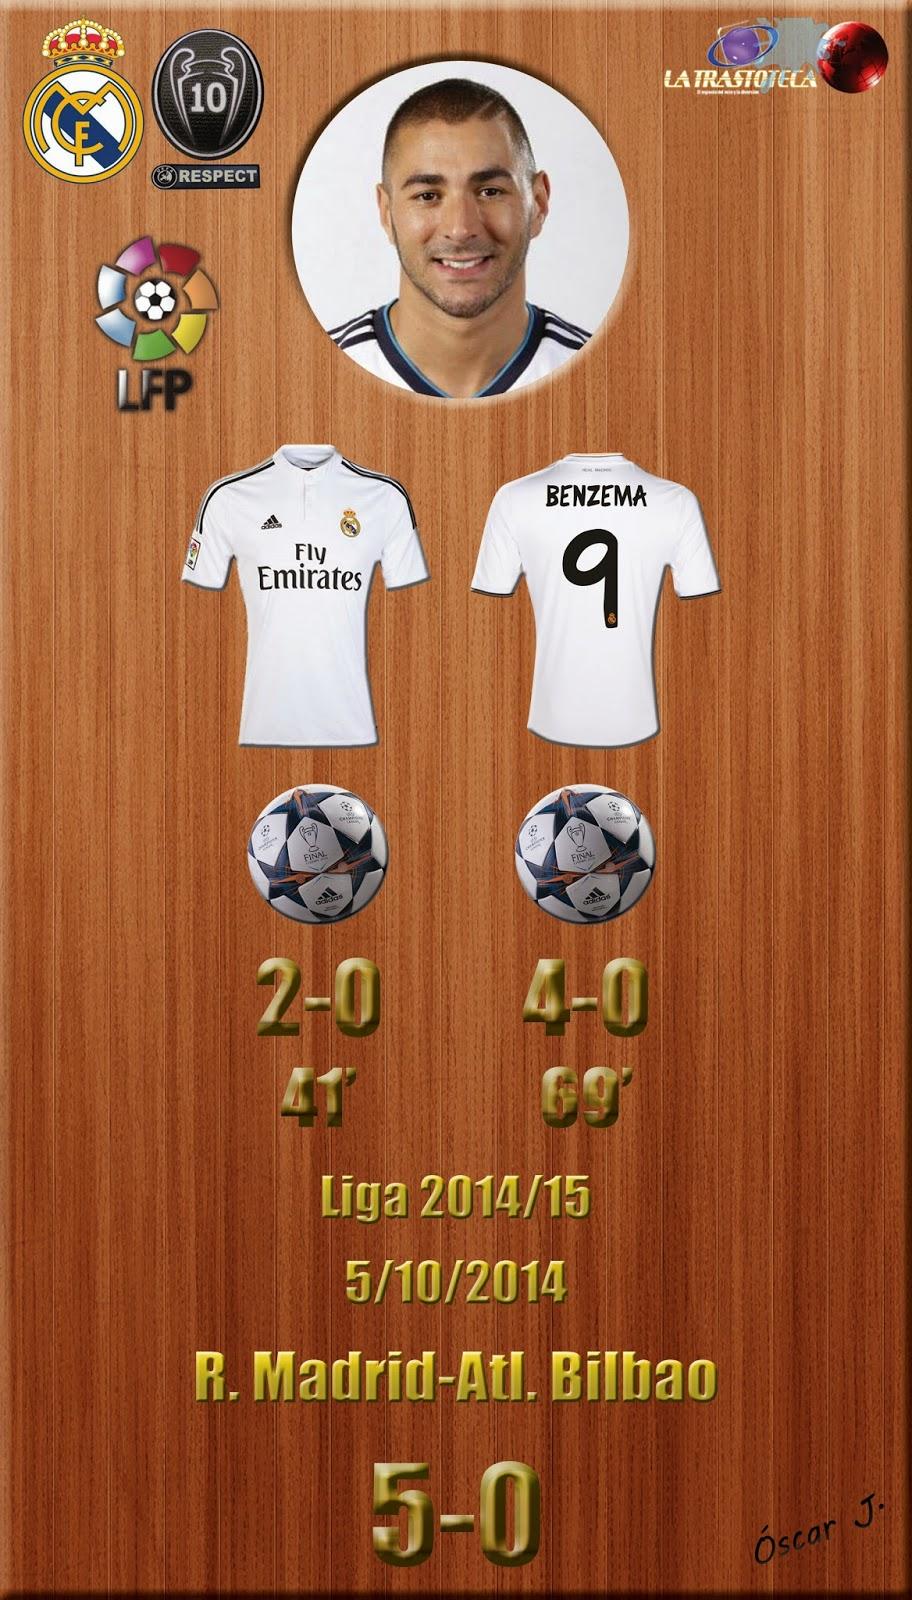 Real Madrid 5-0 Atletic Bilbao - Liga 2014/15 - Jornada 7 (5/10/2014) - 22 Hat-Trick de Cristiano Ronaldo.